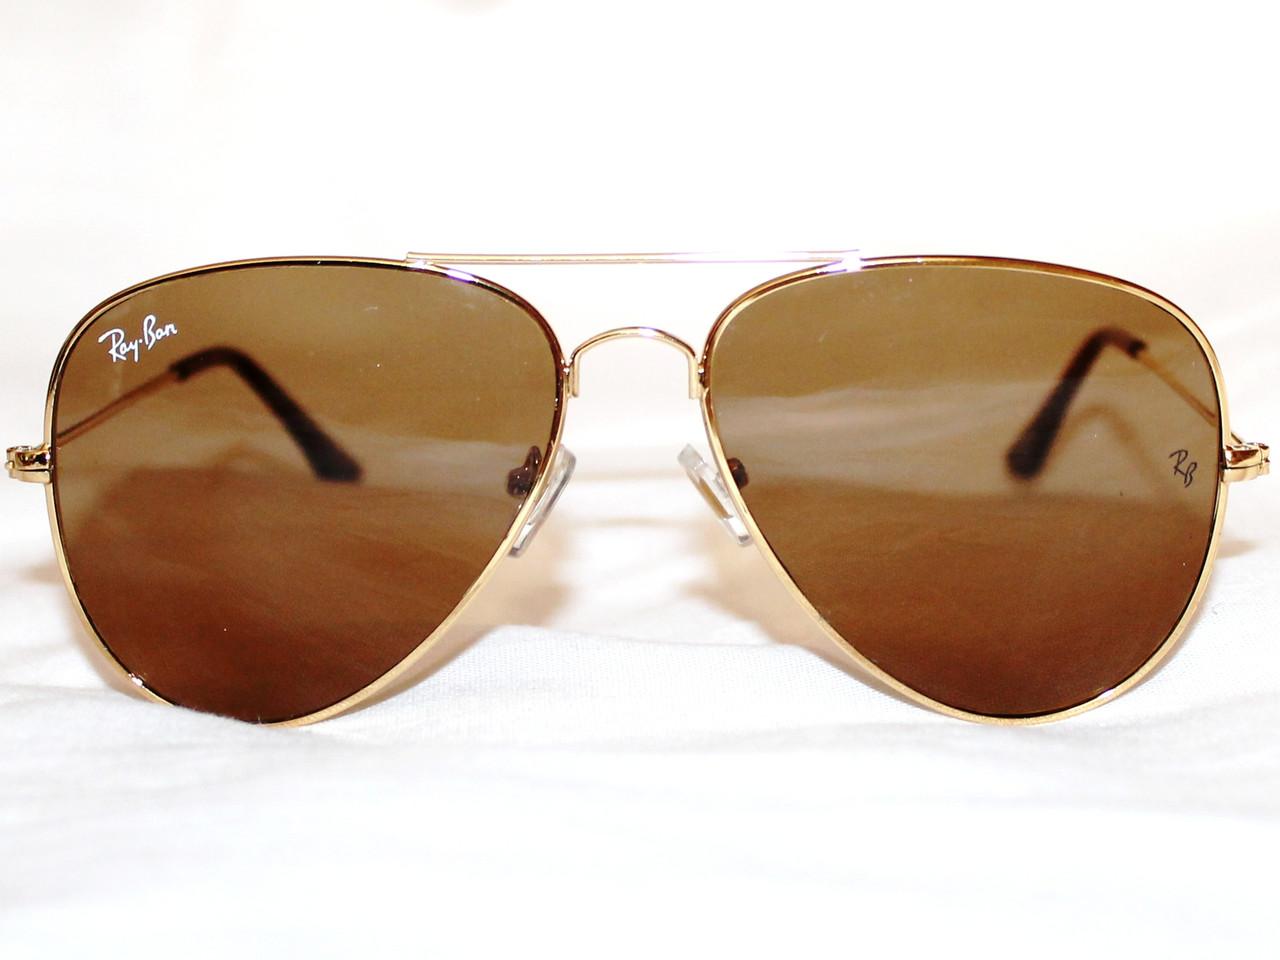 689f11674a68 Очки Ray Ban AVIATOR 3026 золото коричневый стекло реплика - IF-Style в  Одессе